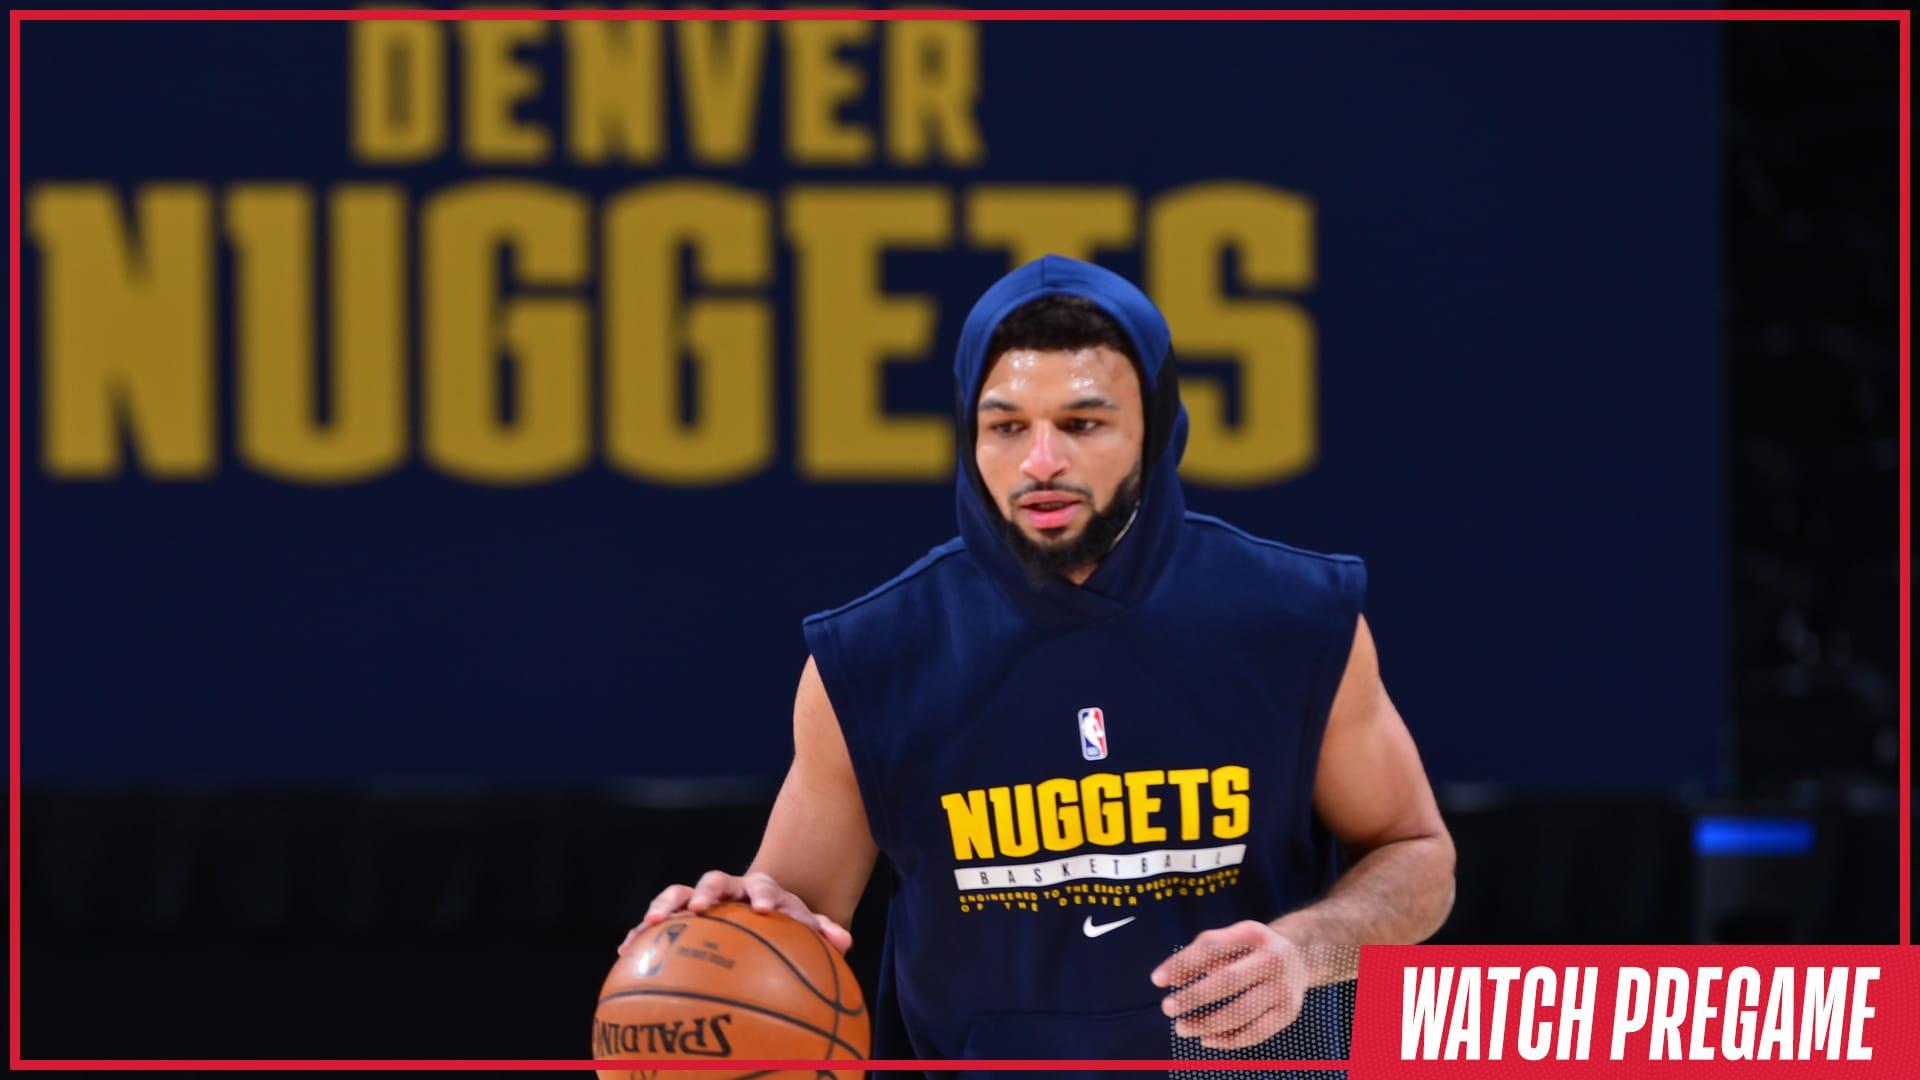 Watch Free: Jazz vs. Nuggets Pregame